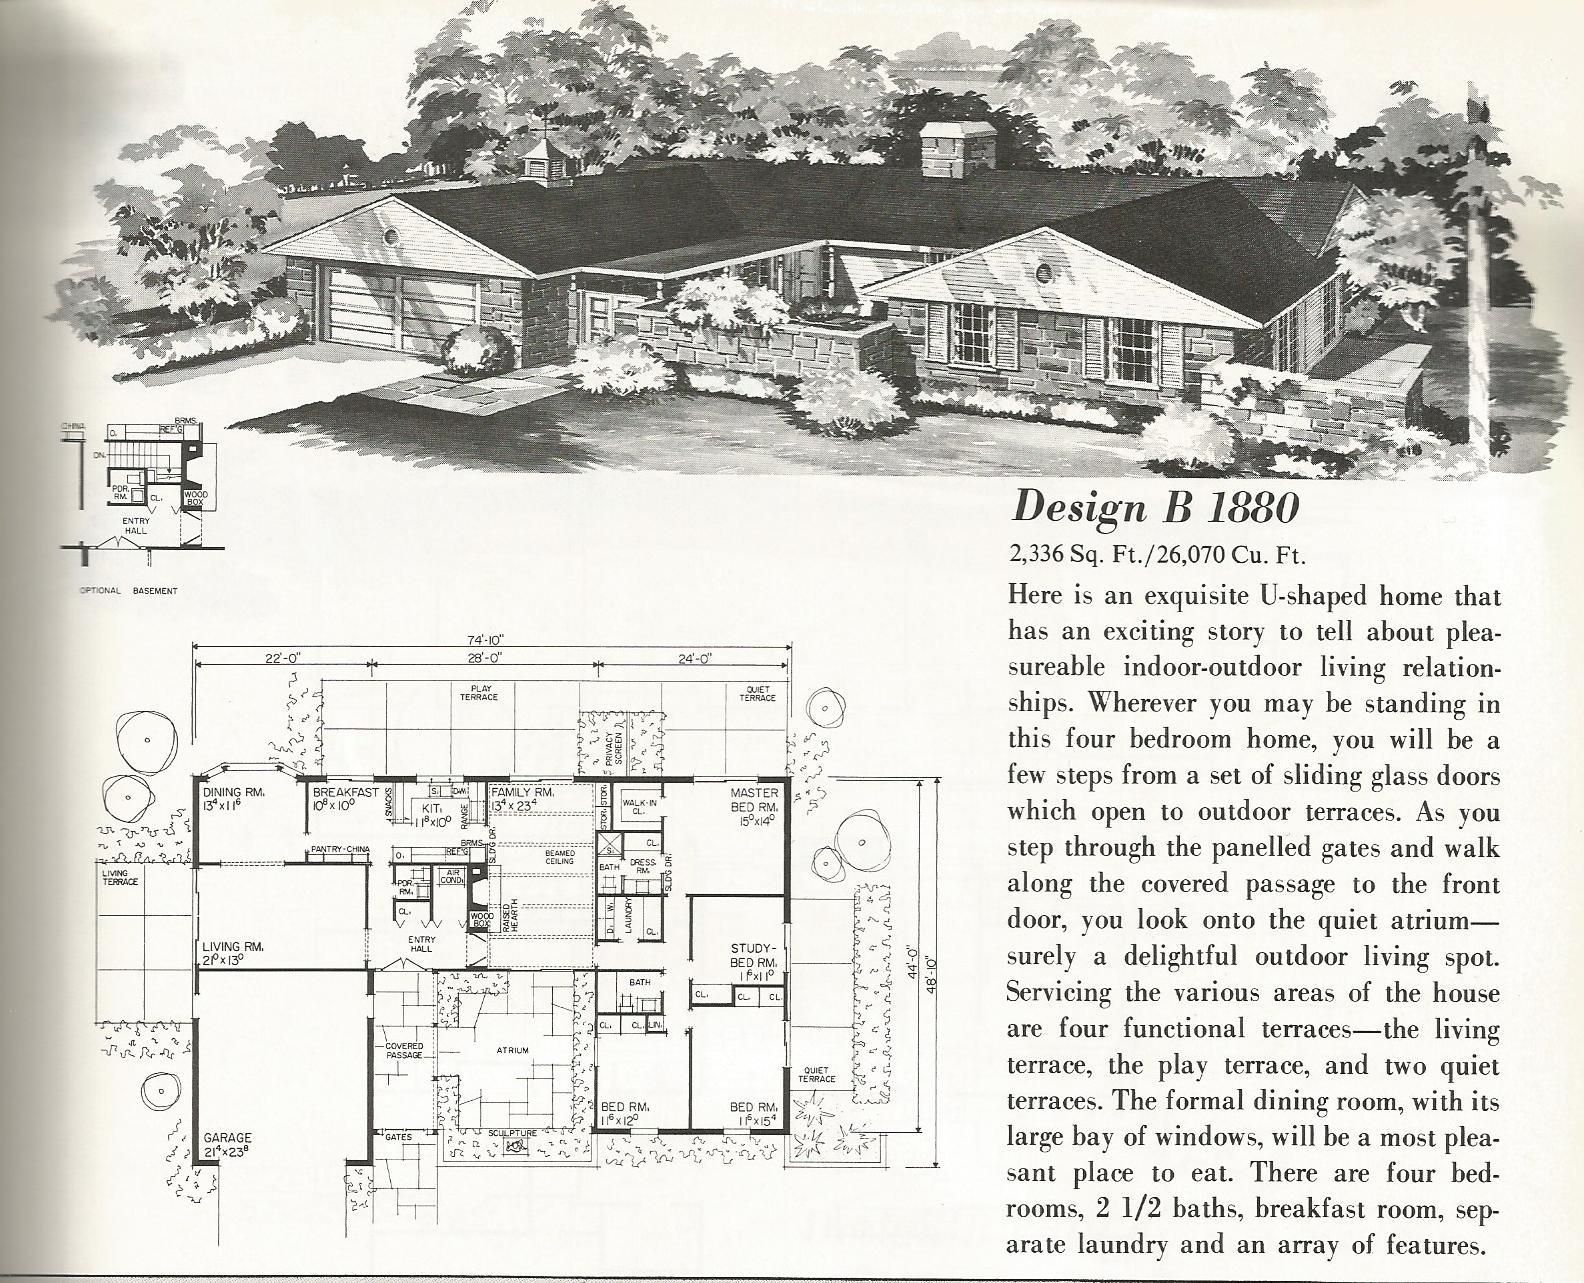 Vintage House Plans Mid Century Homes U Shaped Houses U Shaped House Plans Vintage House Plans New House Plans